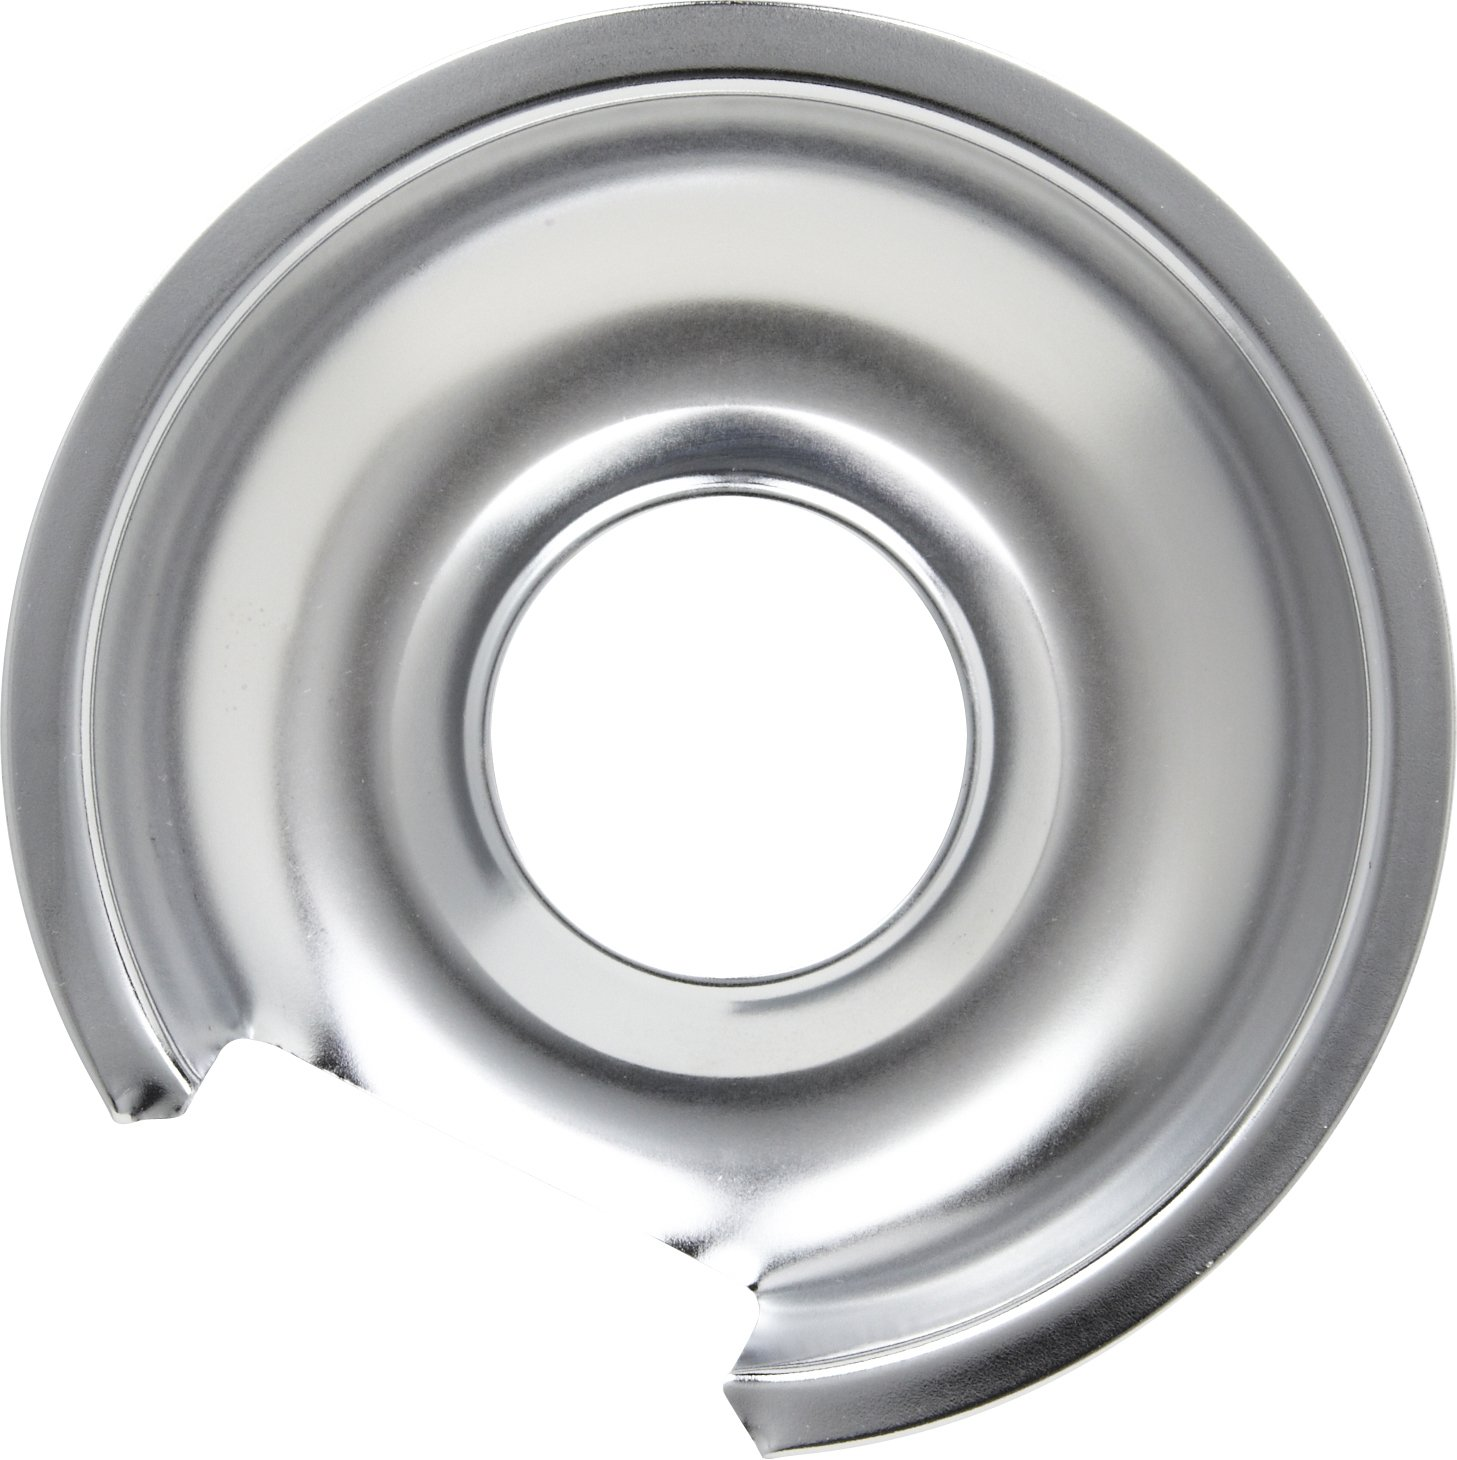 GE WB32X10012 6-Inch Drip Pan